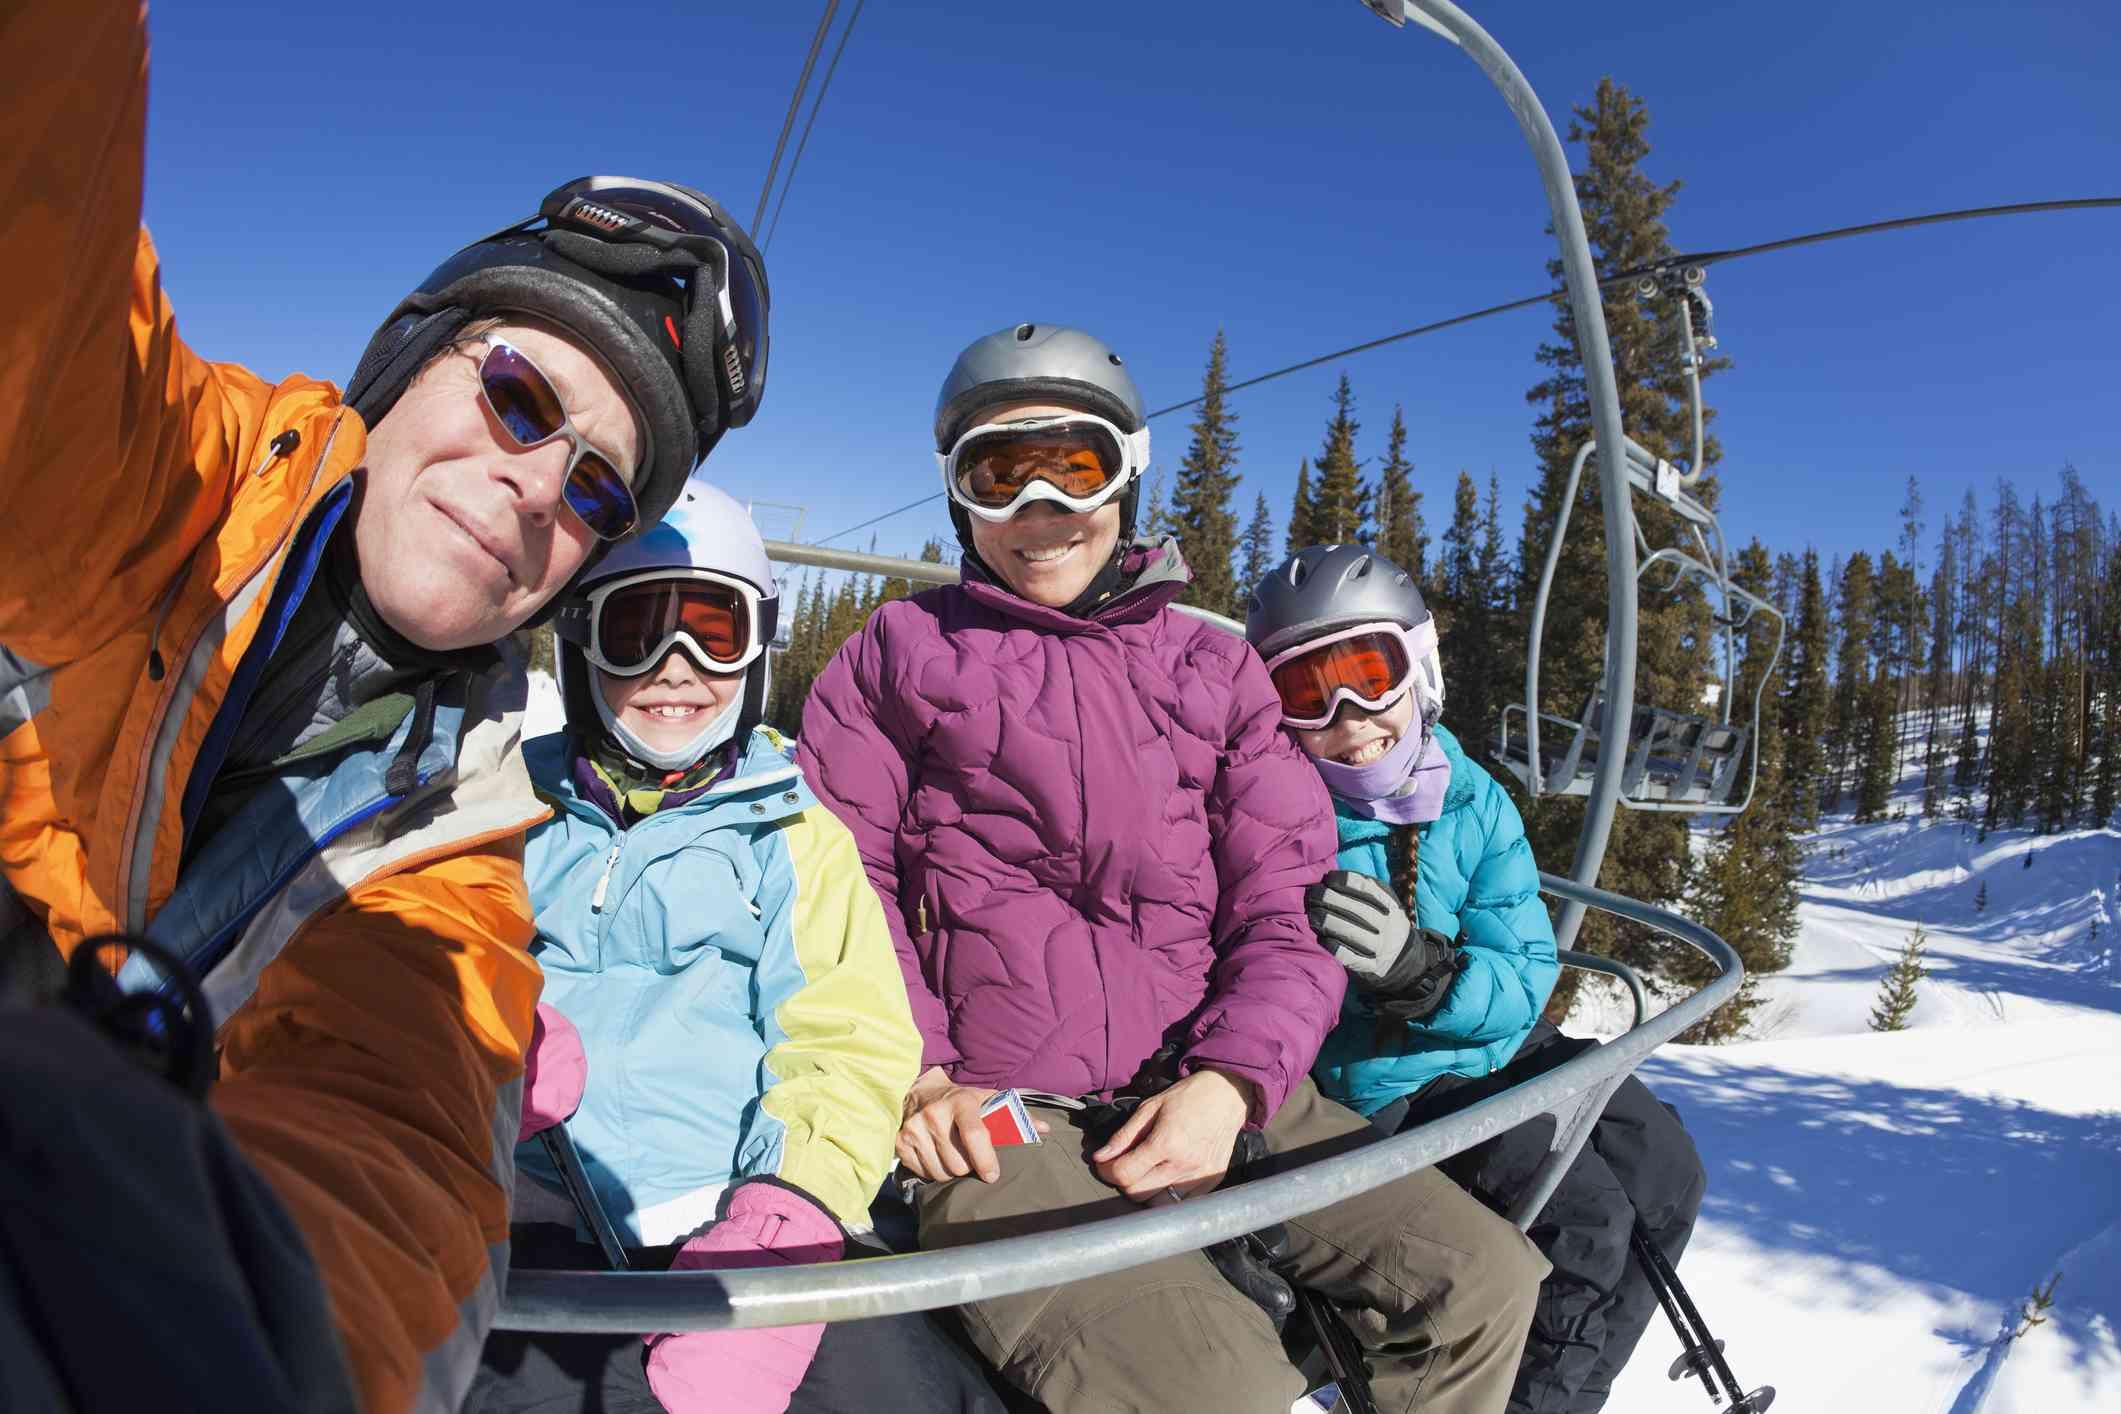 Family on ski lift